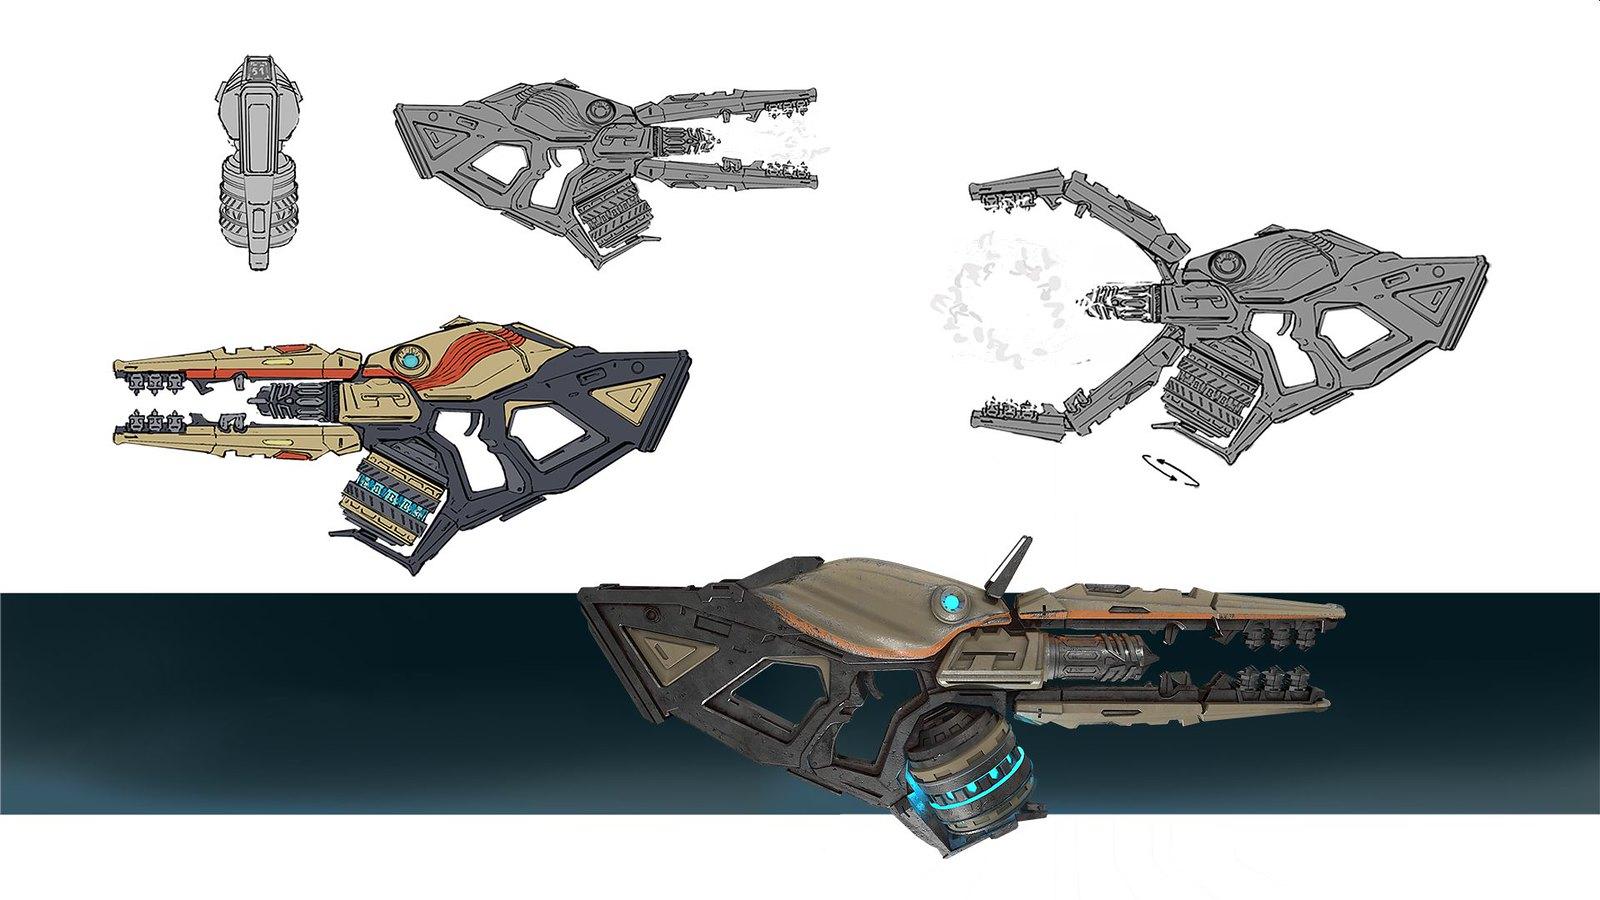 Telefrag VR - Plasma rifle concept